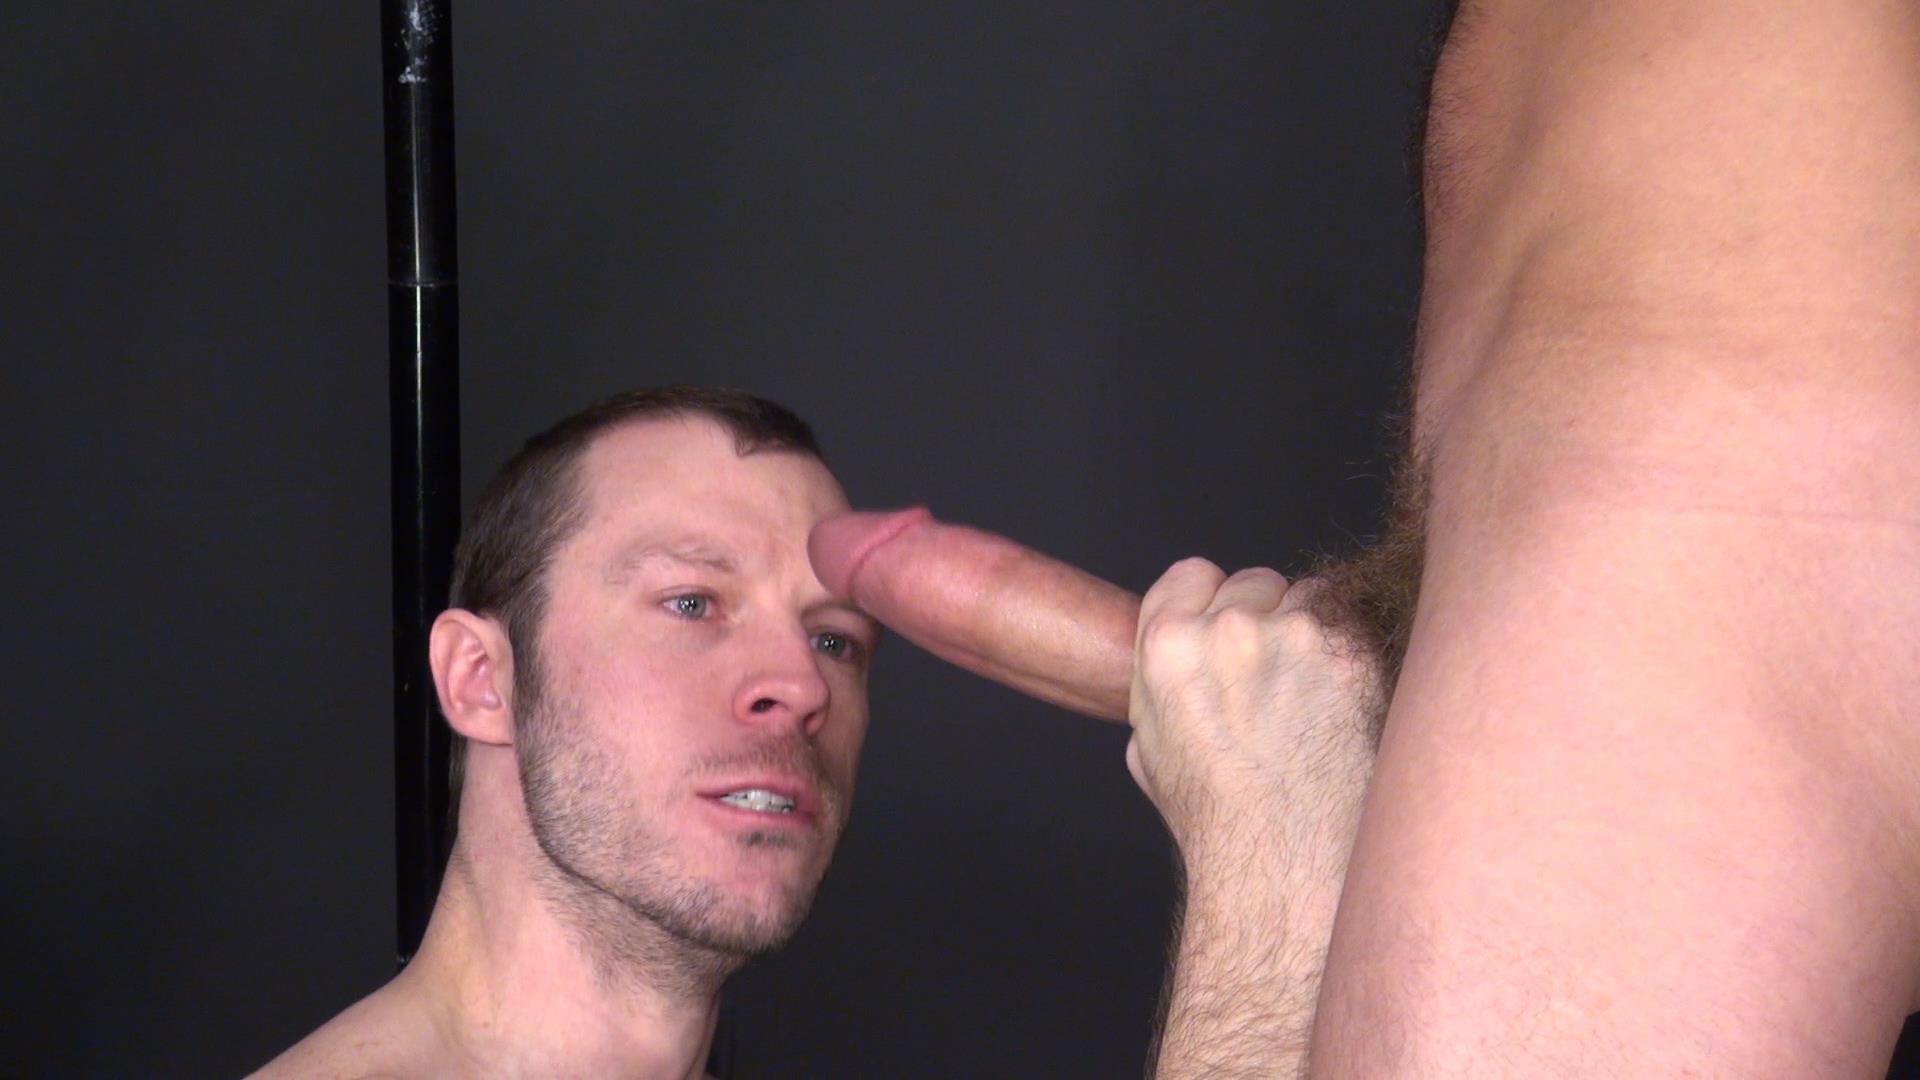 Raw-and-Rough-Blake-Dawson-and-Super-Steve-Horse-Cock-Bareback-Breeding-Amateur-Gay-Porn-12 Huge Cock Bareback Breeding A Tight Hole In A Sex Sling